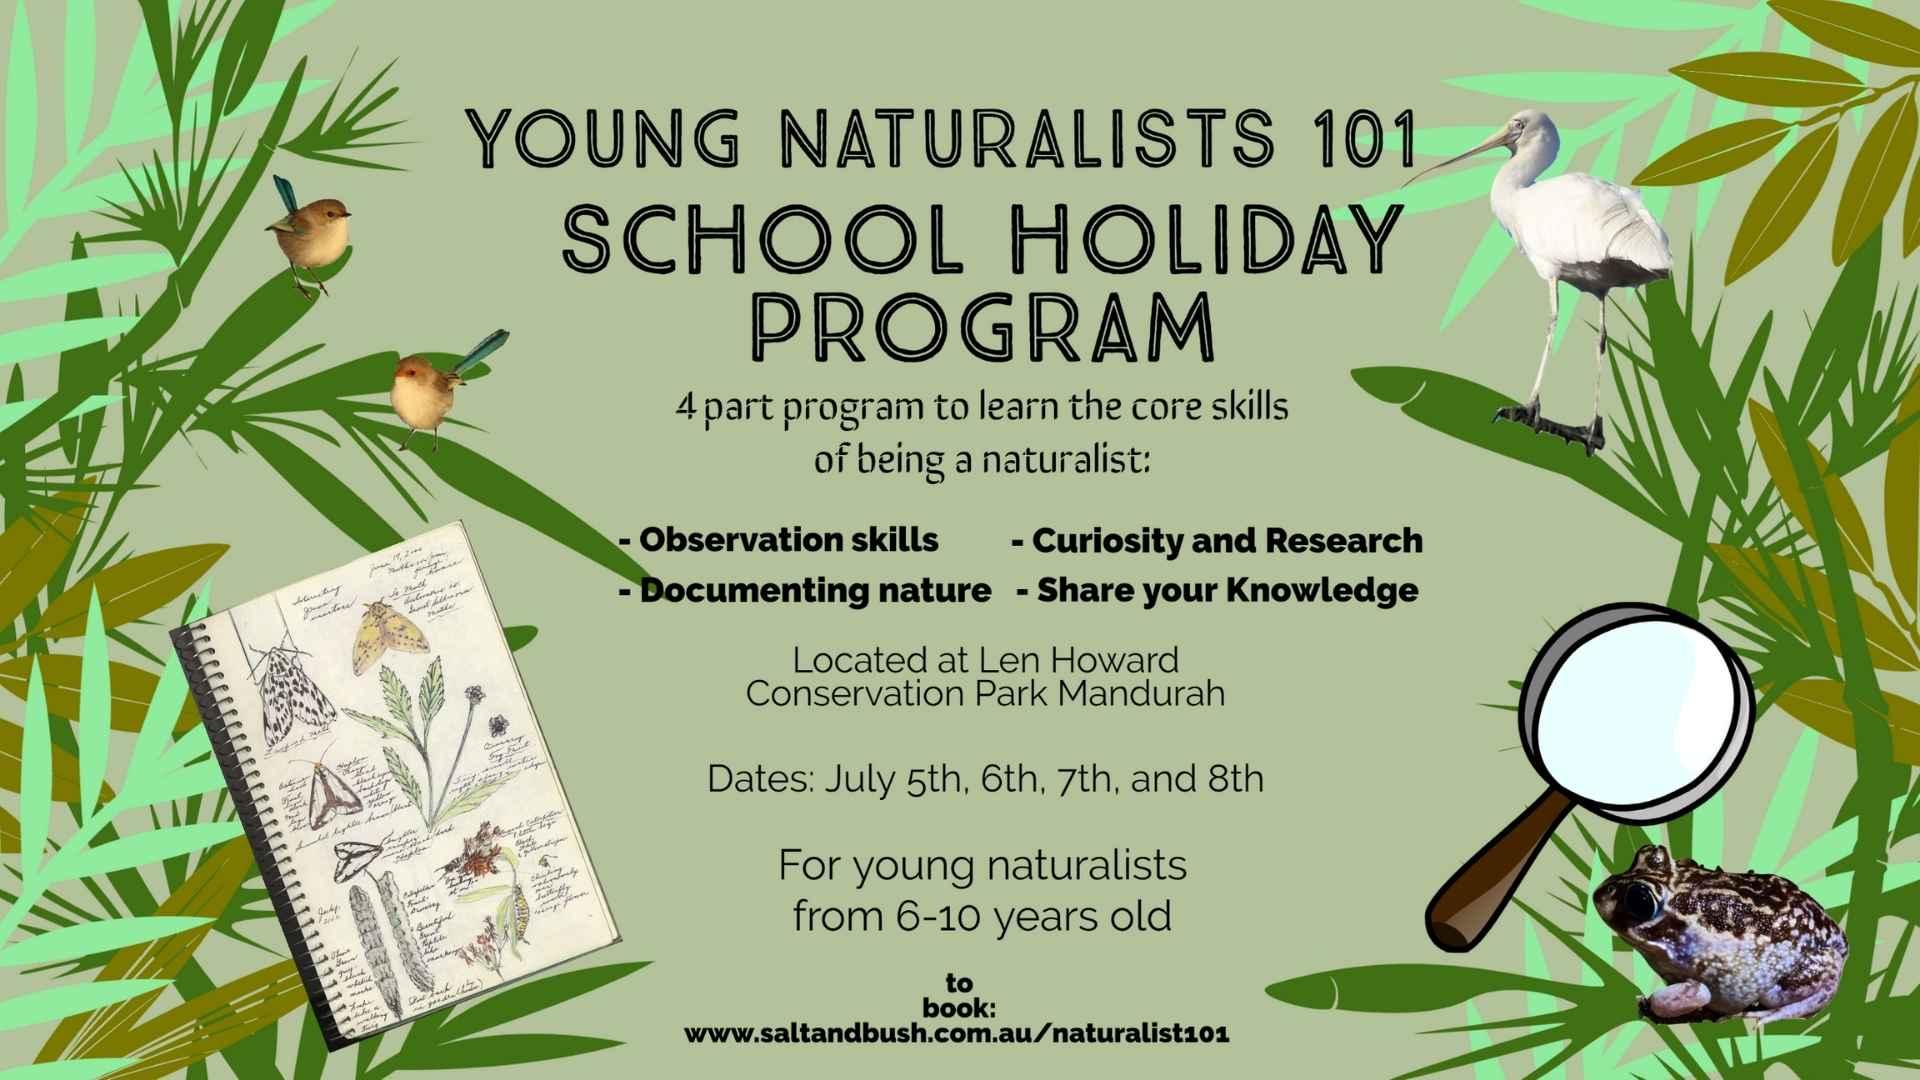 Young Naturalist School Holiday Program